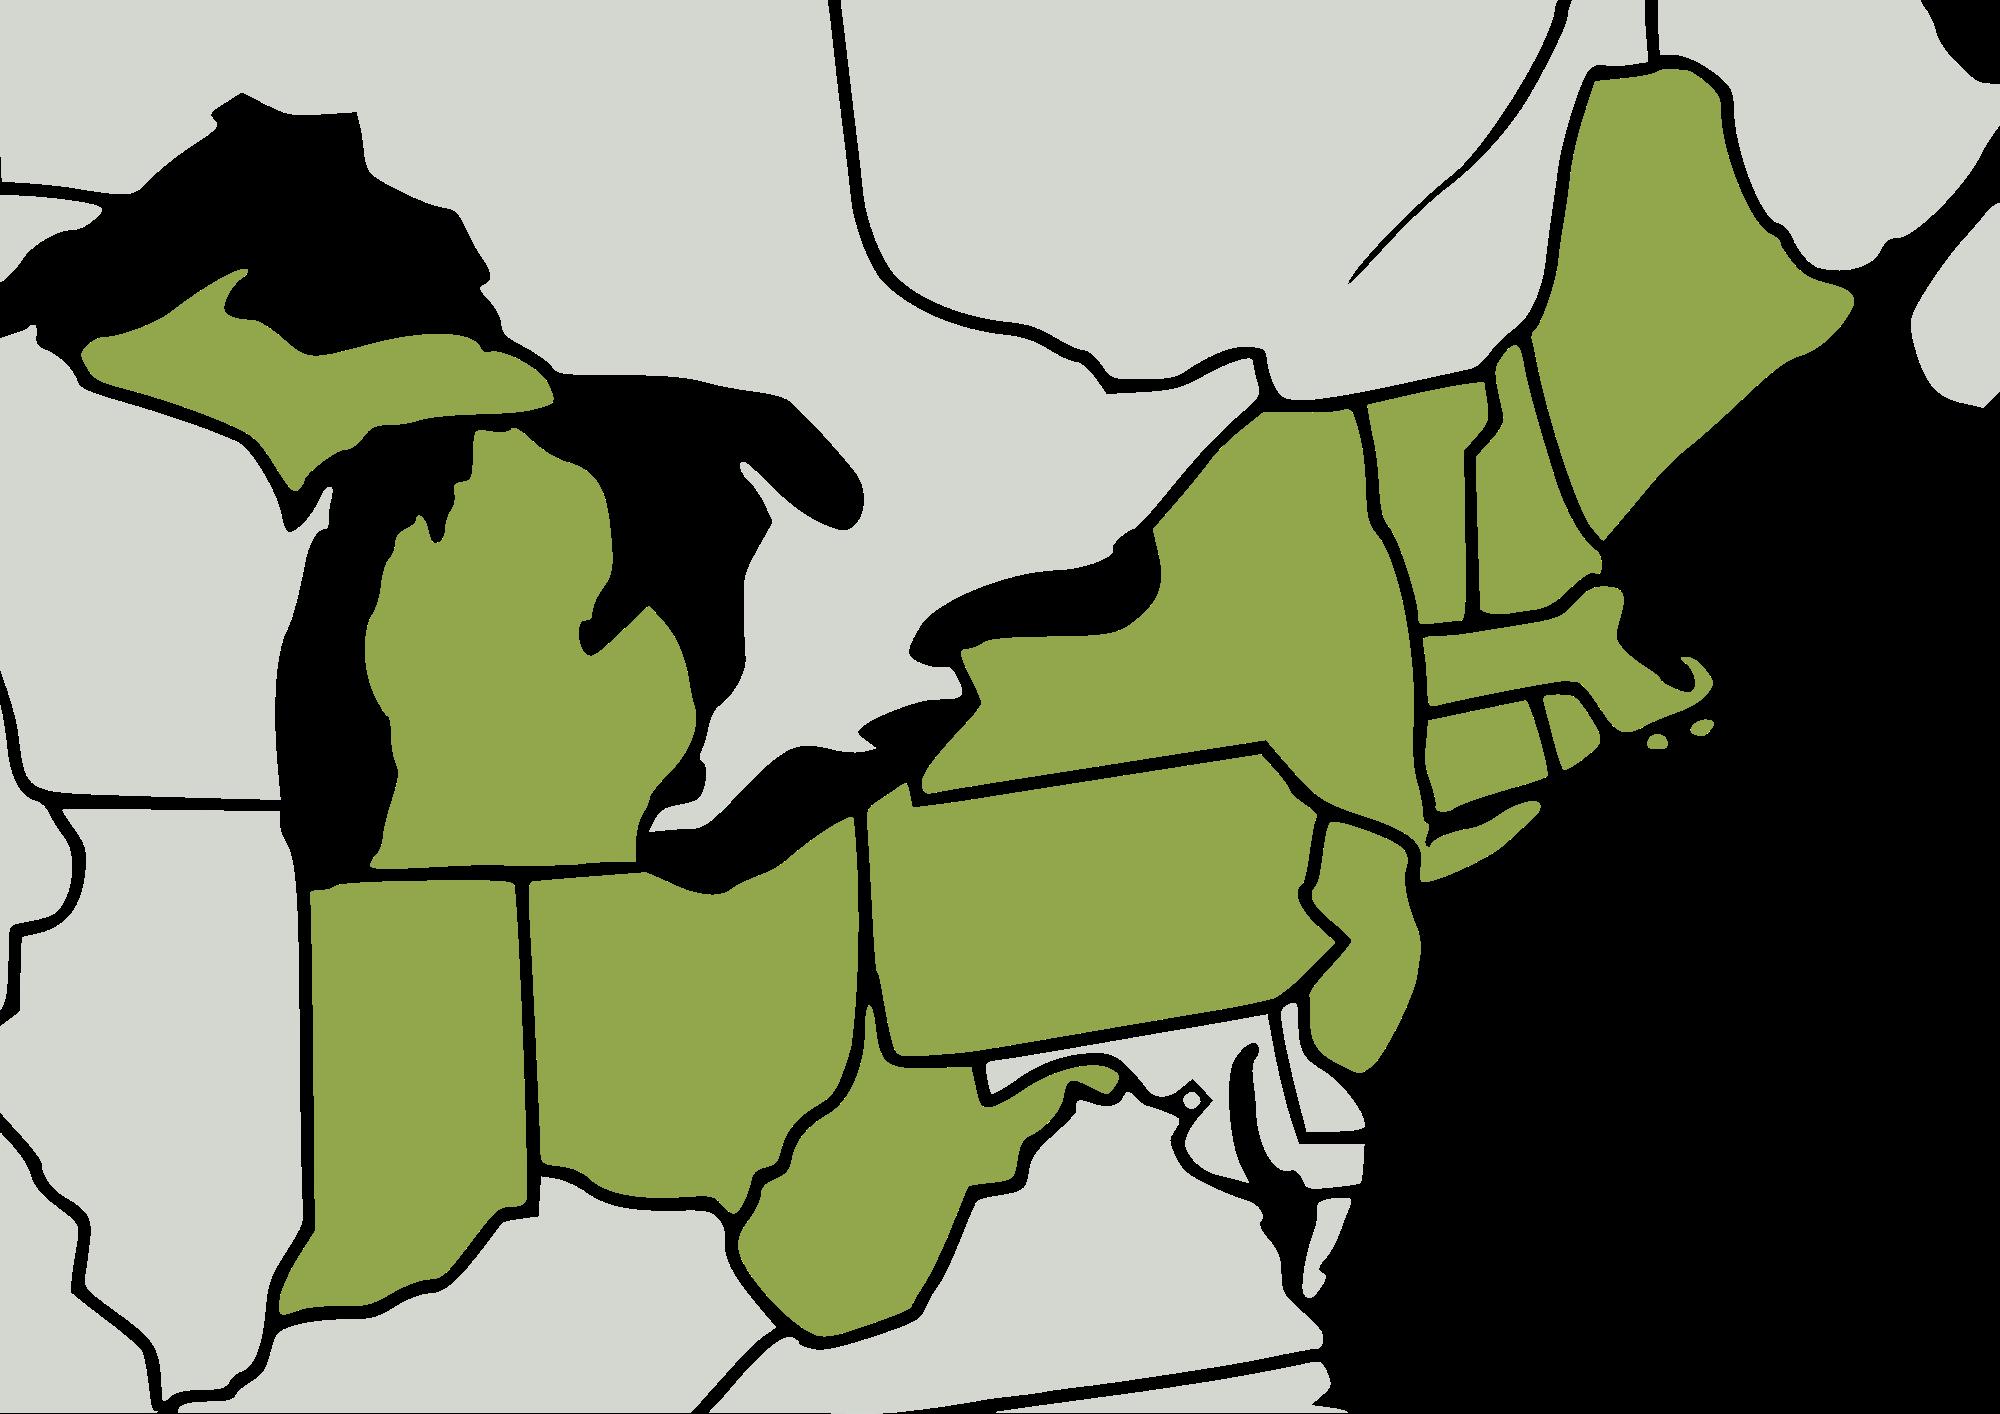 northeast region   ThingLink